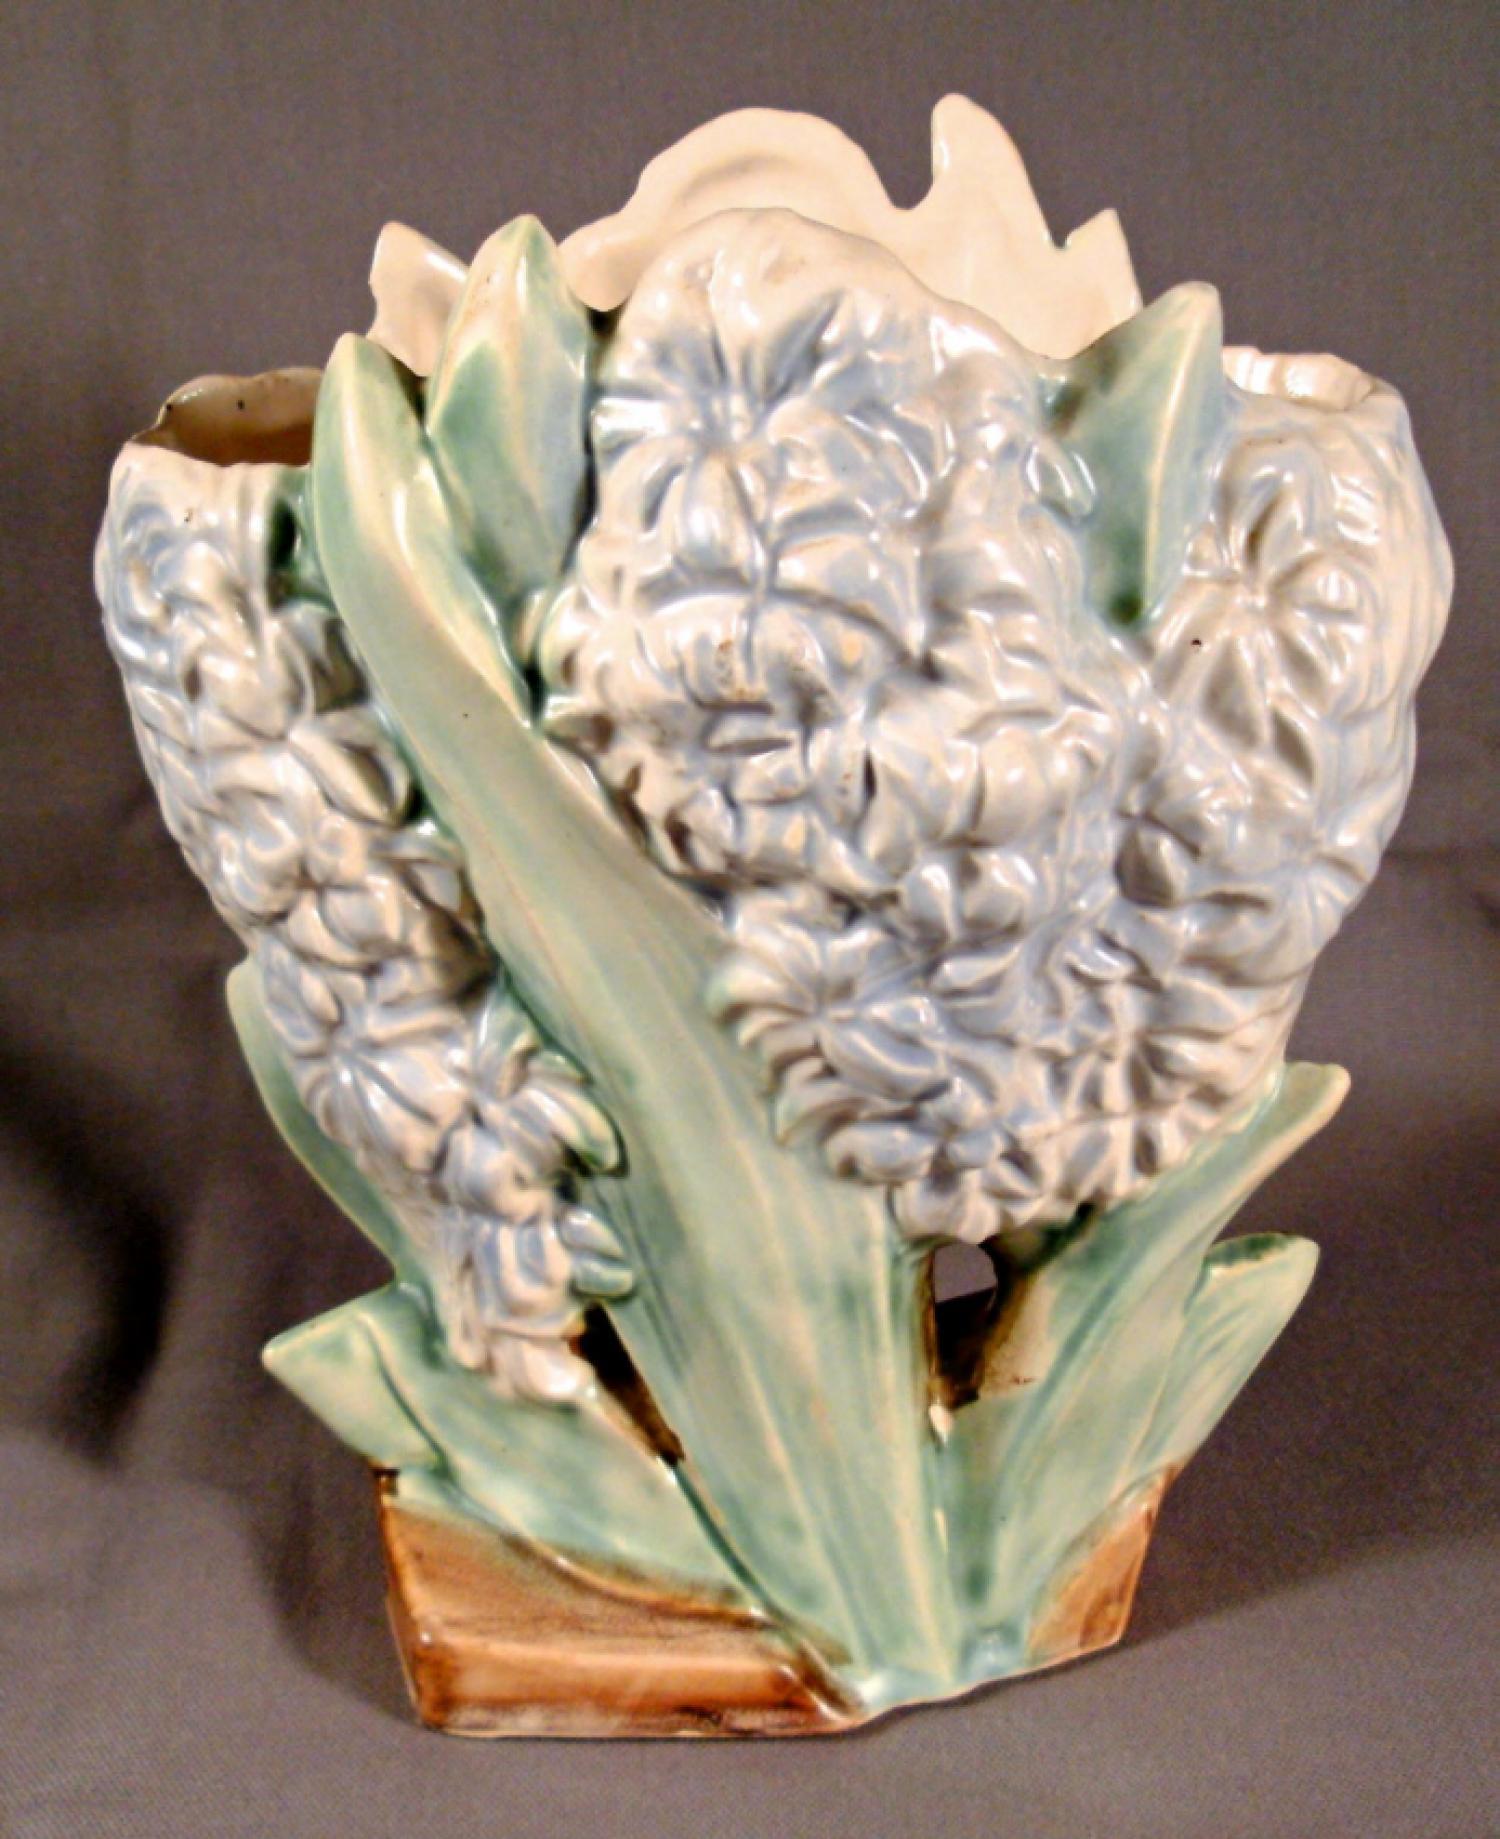 McCoy pottery crocus-motif vase c1920